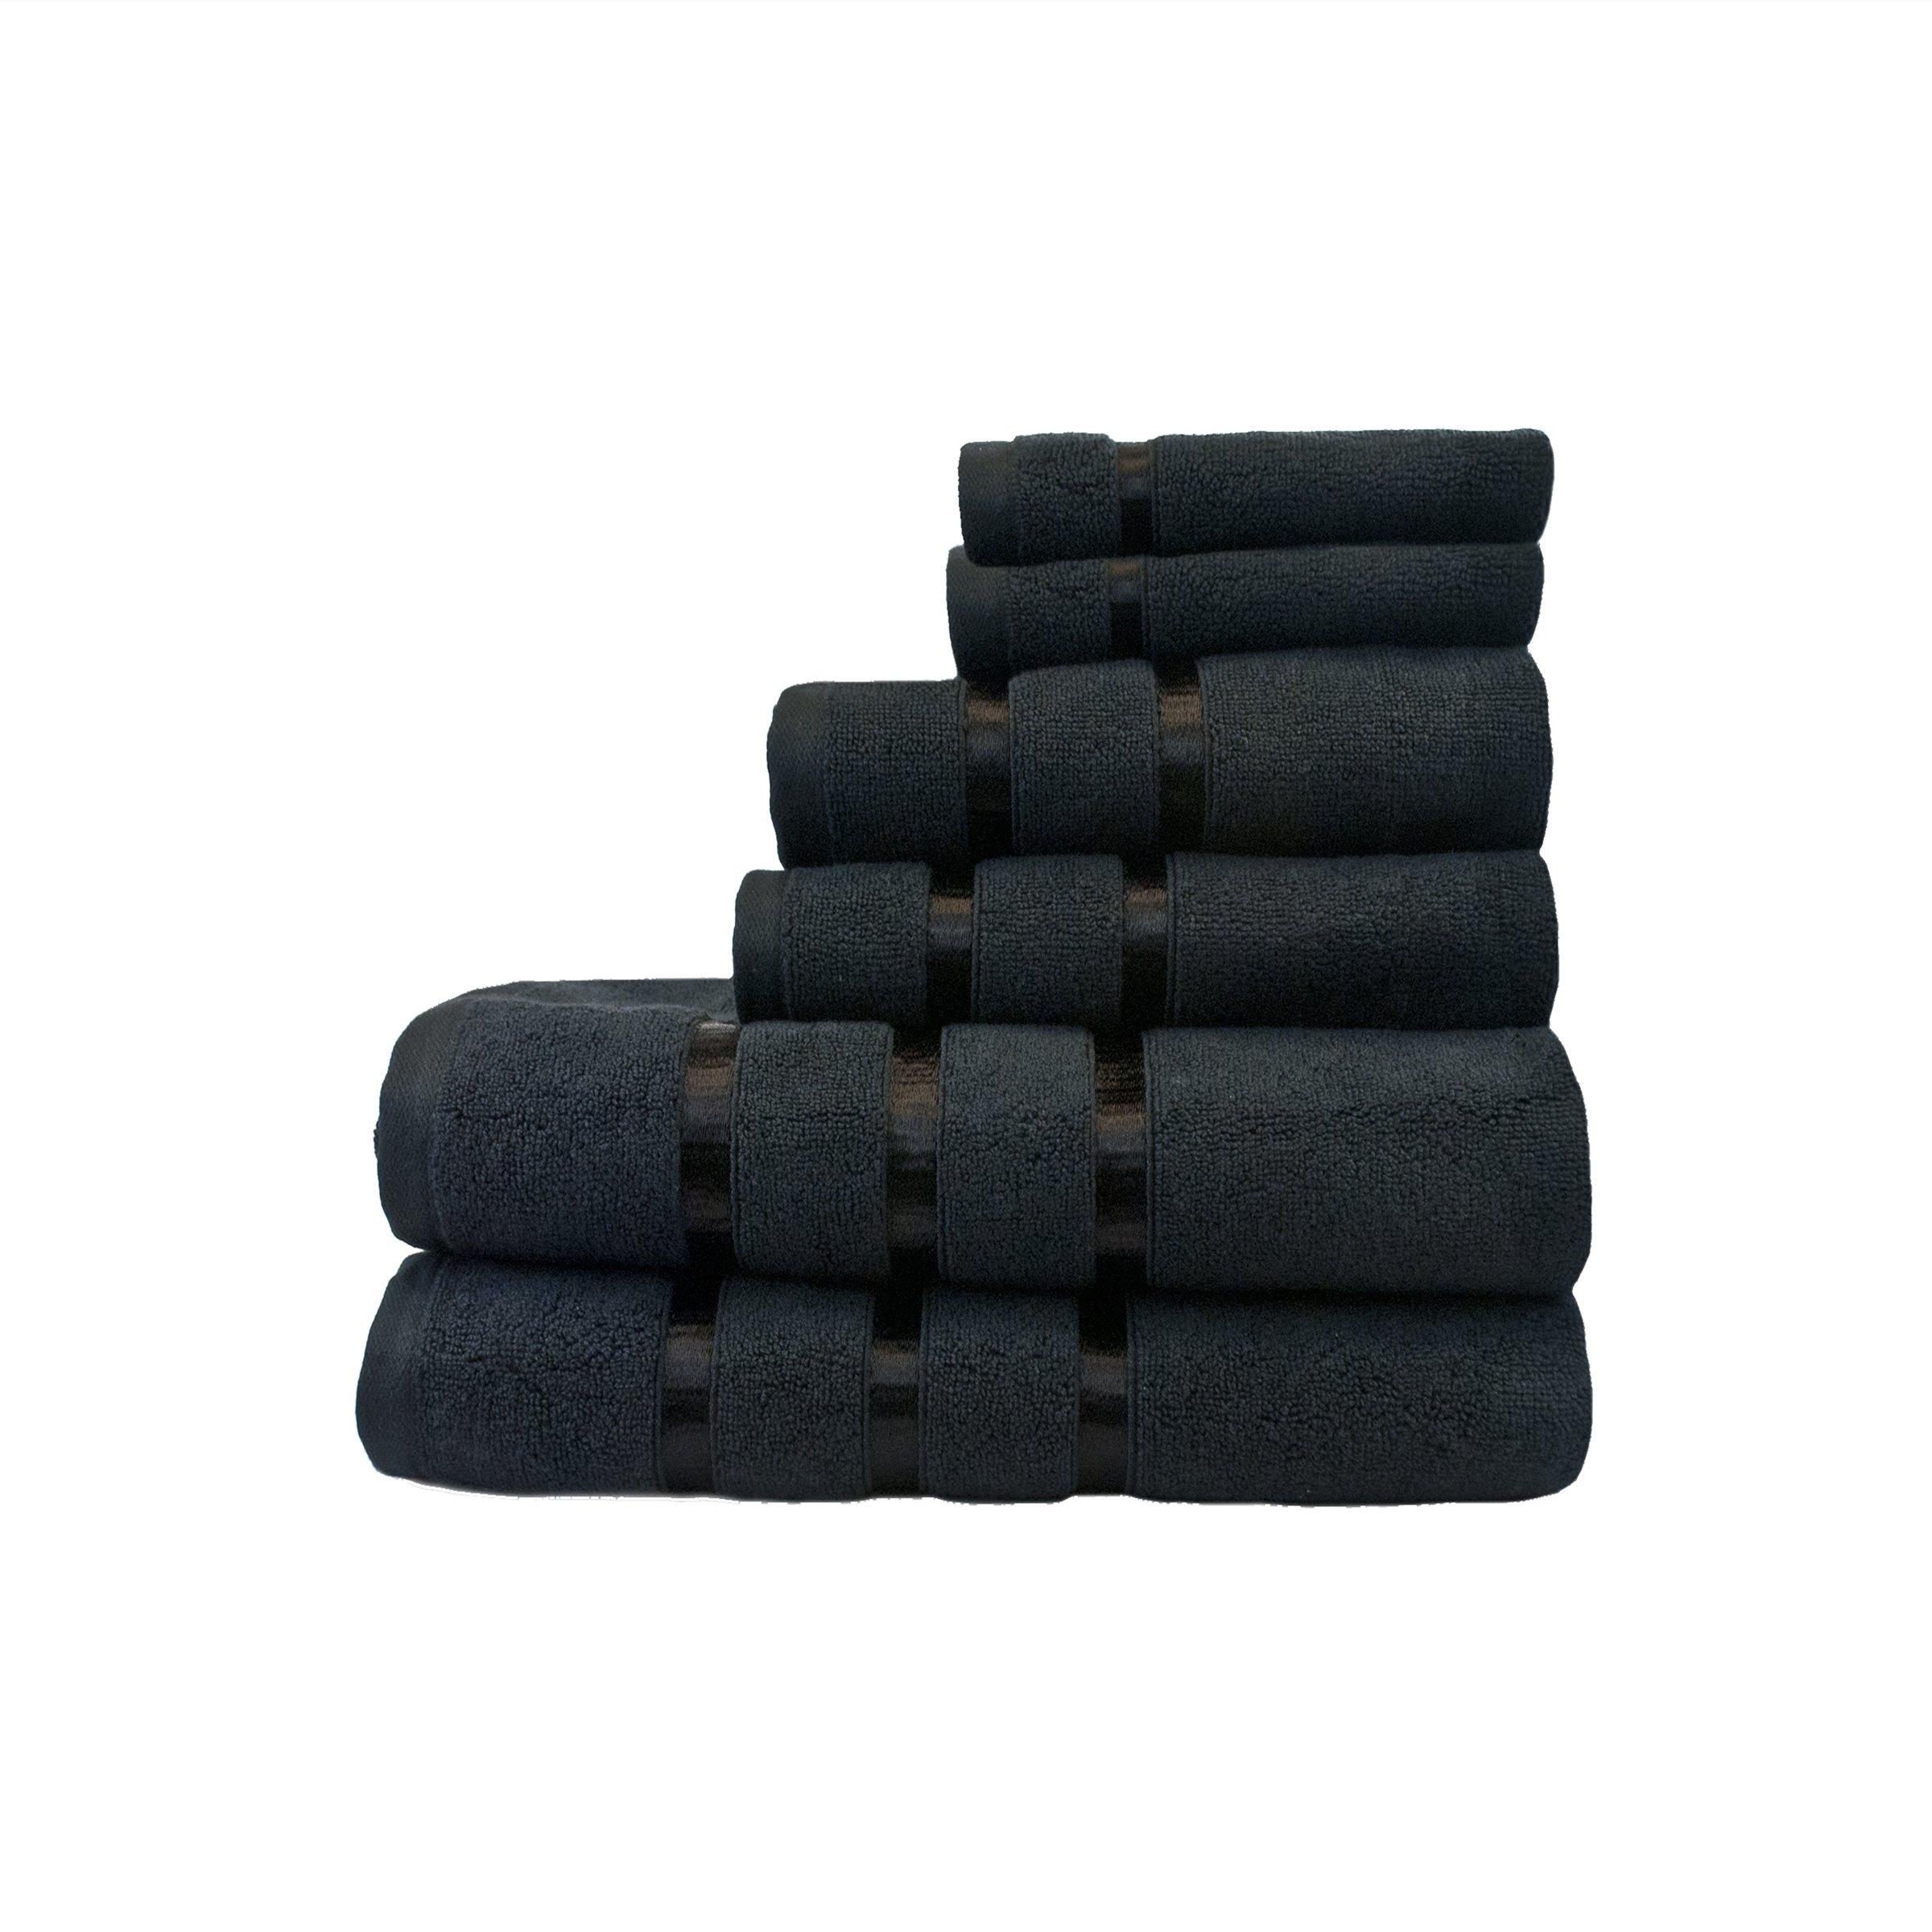 Ausin Horn Classics AHC00178-BLK Austin Horn Classics Hotel Collection 6Piece Bath Towel Set Black